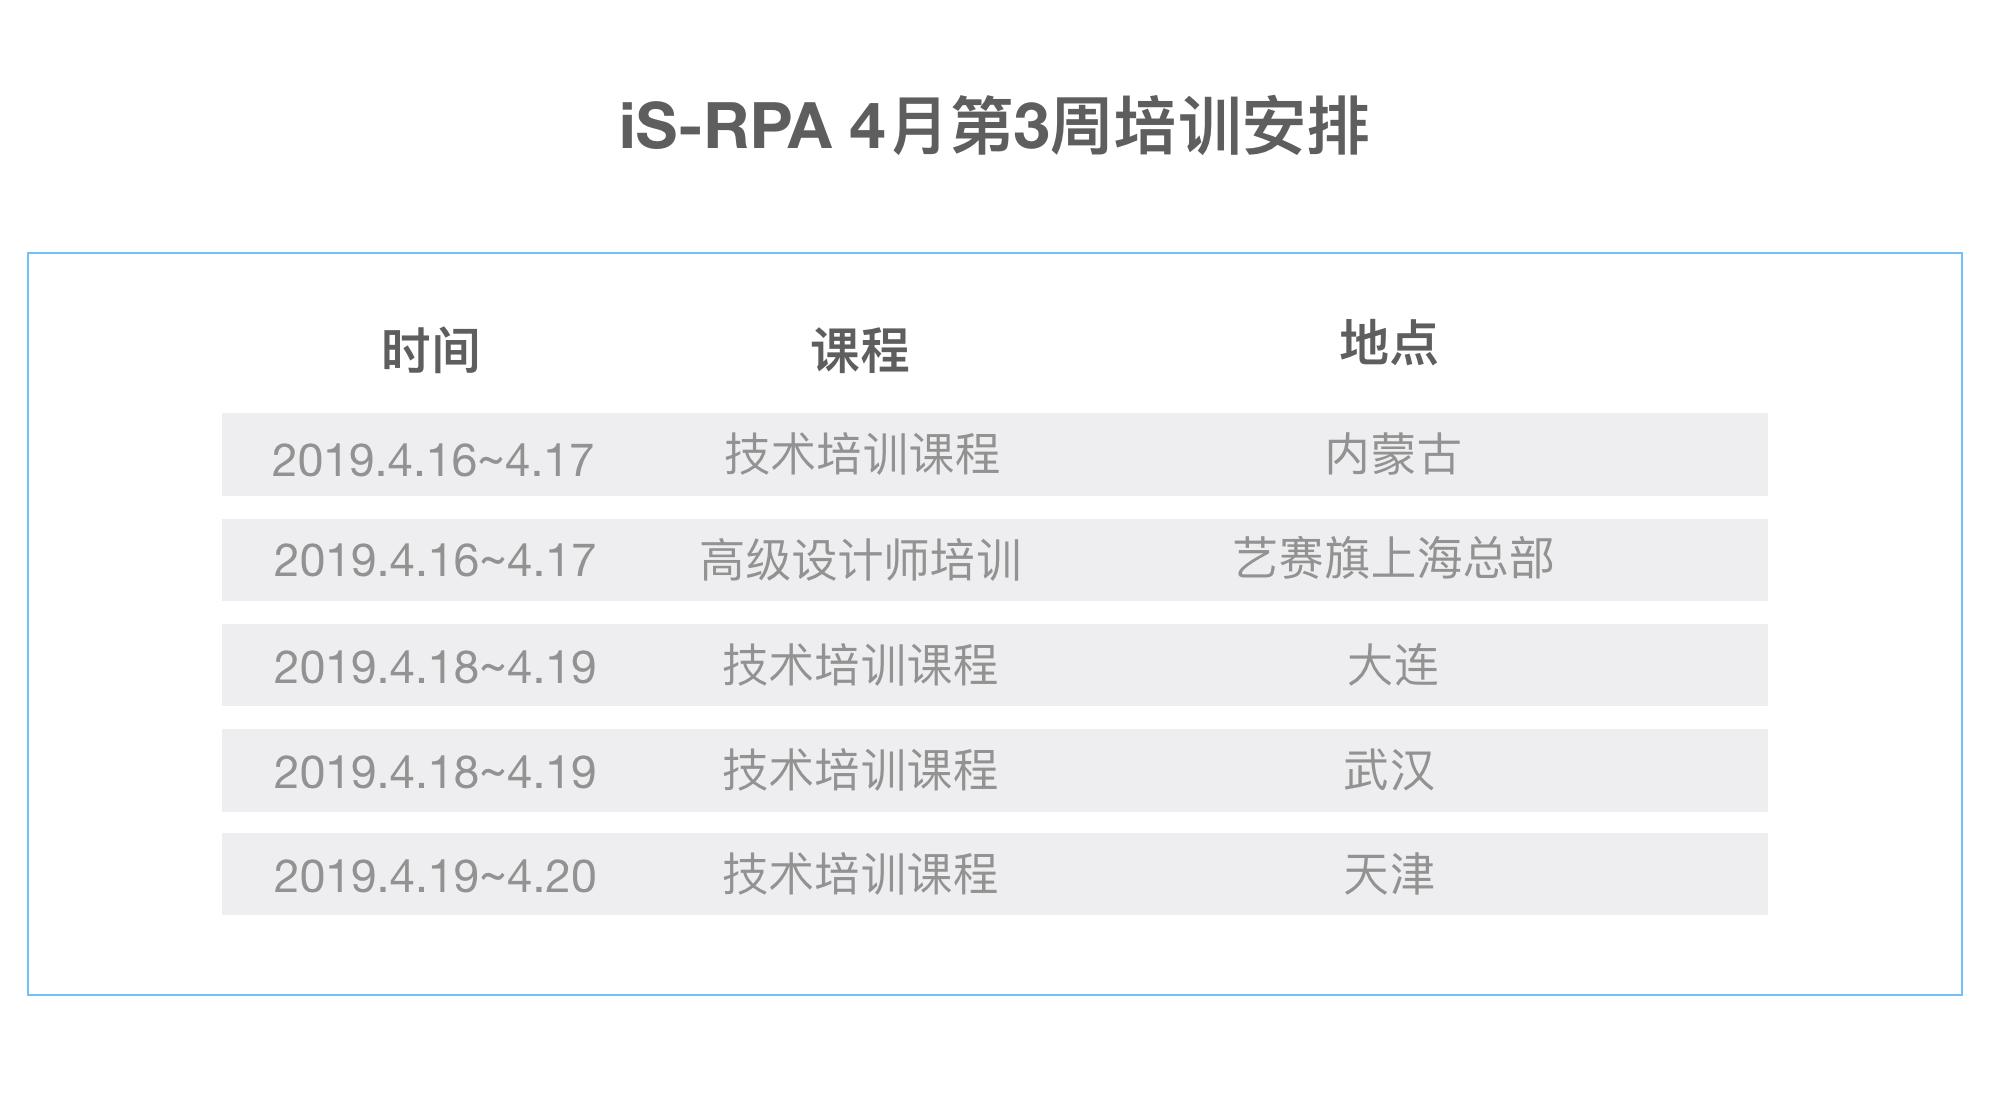 iS-RPA 学院 4 月第 3 周(04/15-04/21)培训安排